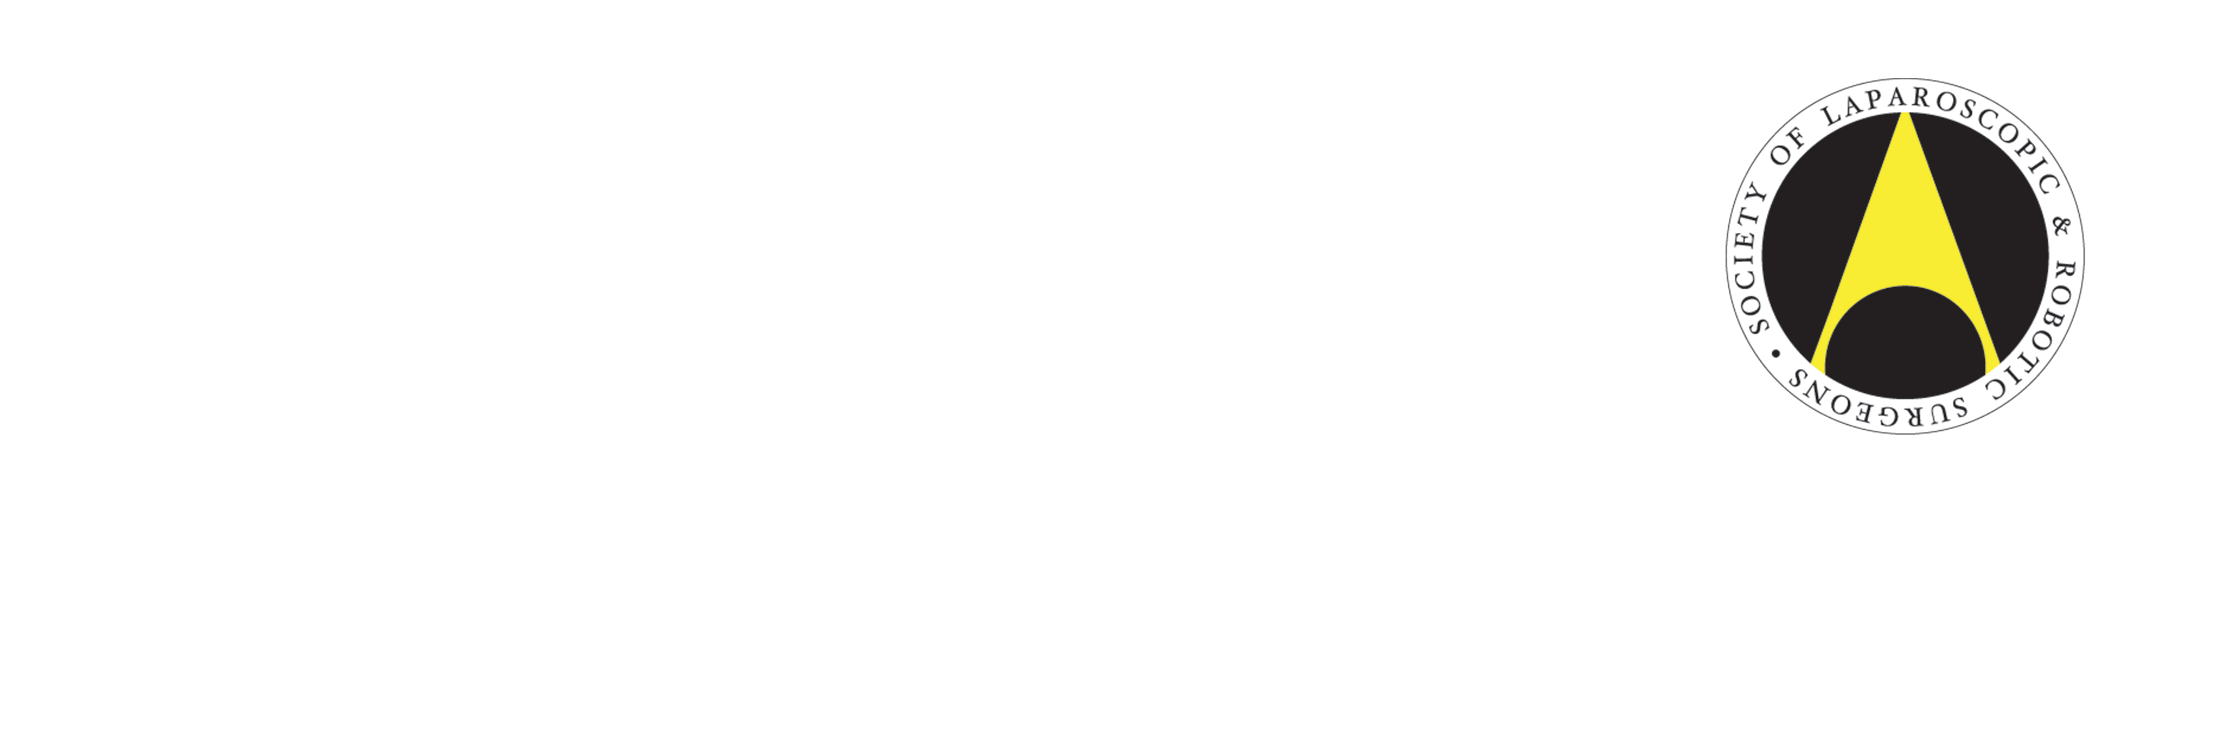 CRSLS